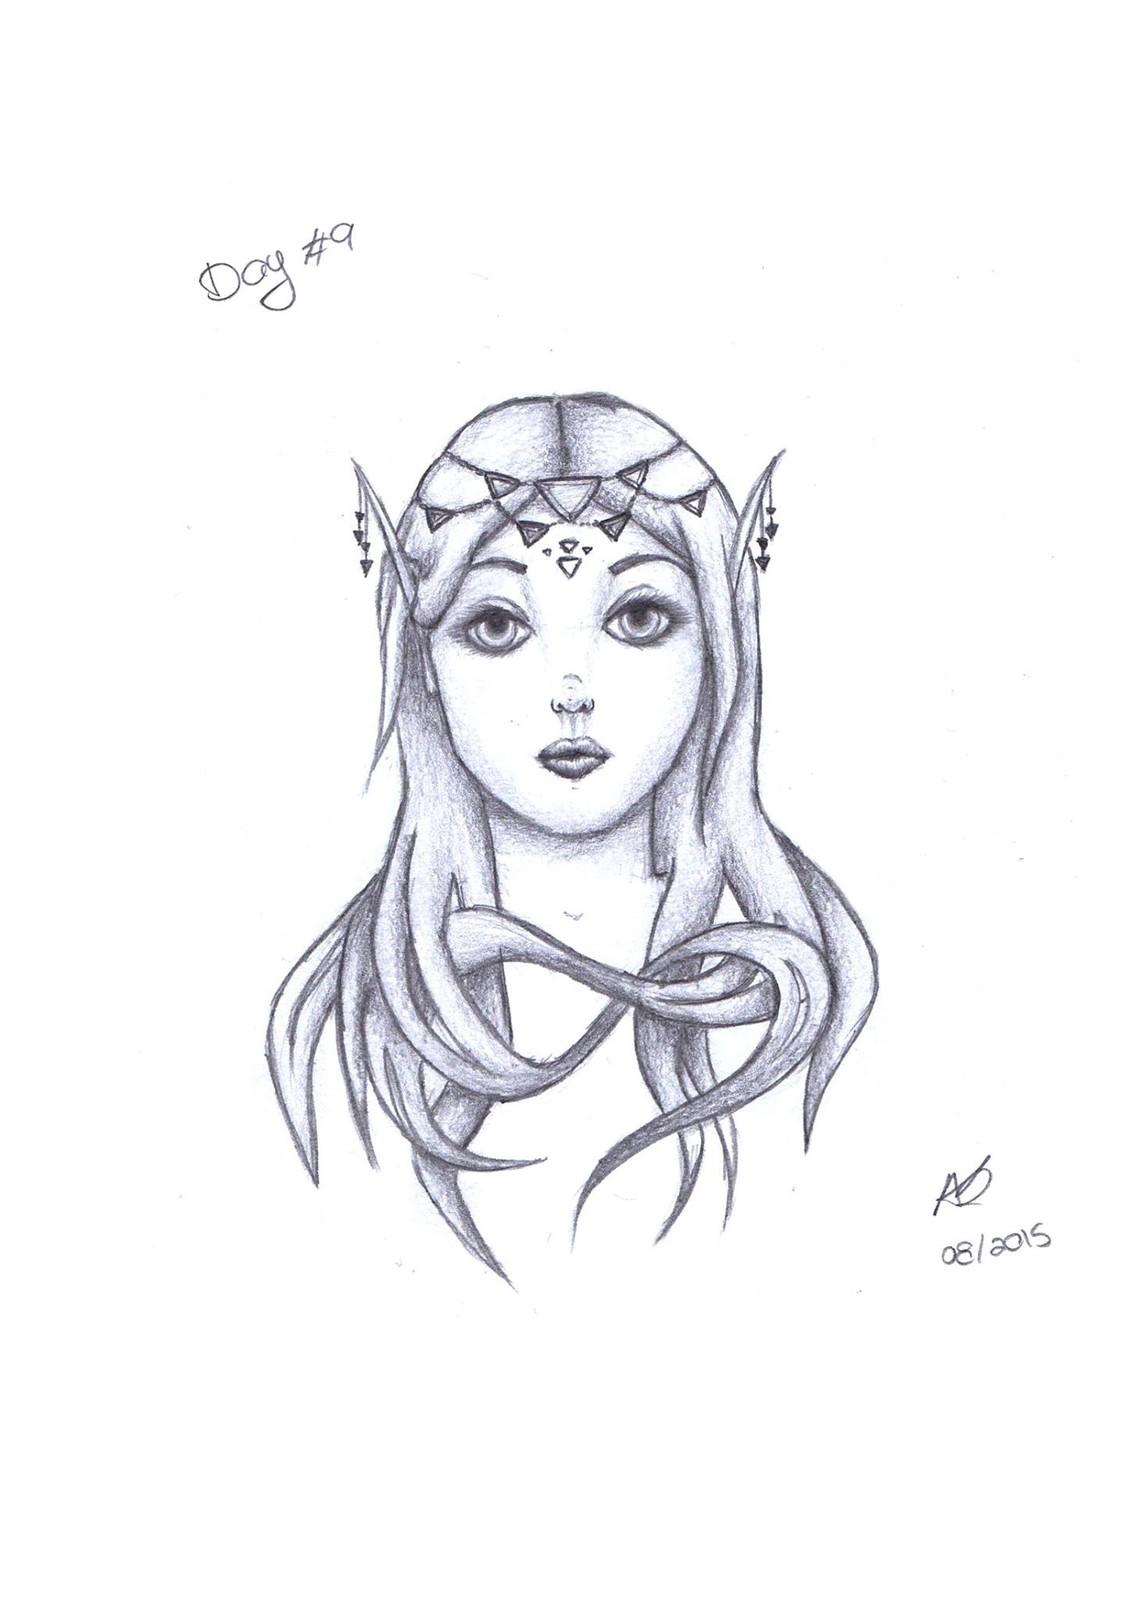 original sketch in 2015